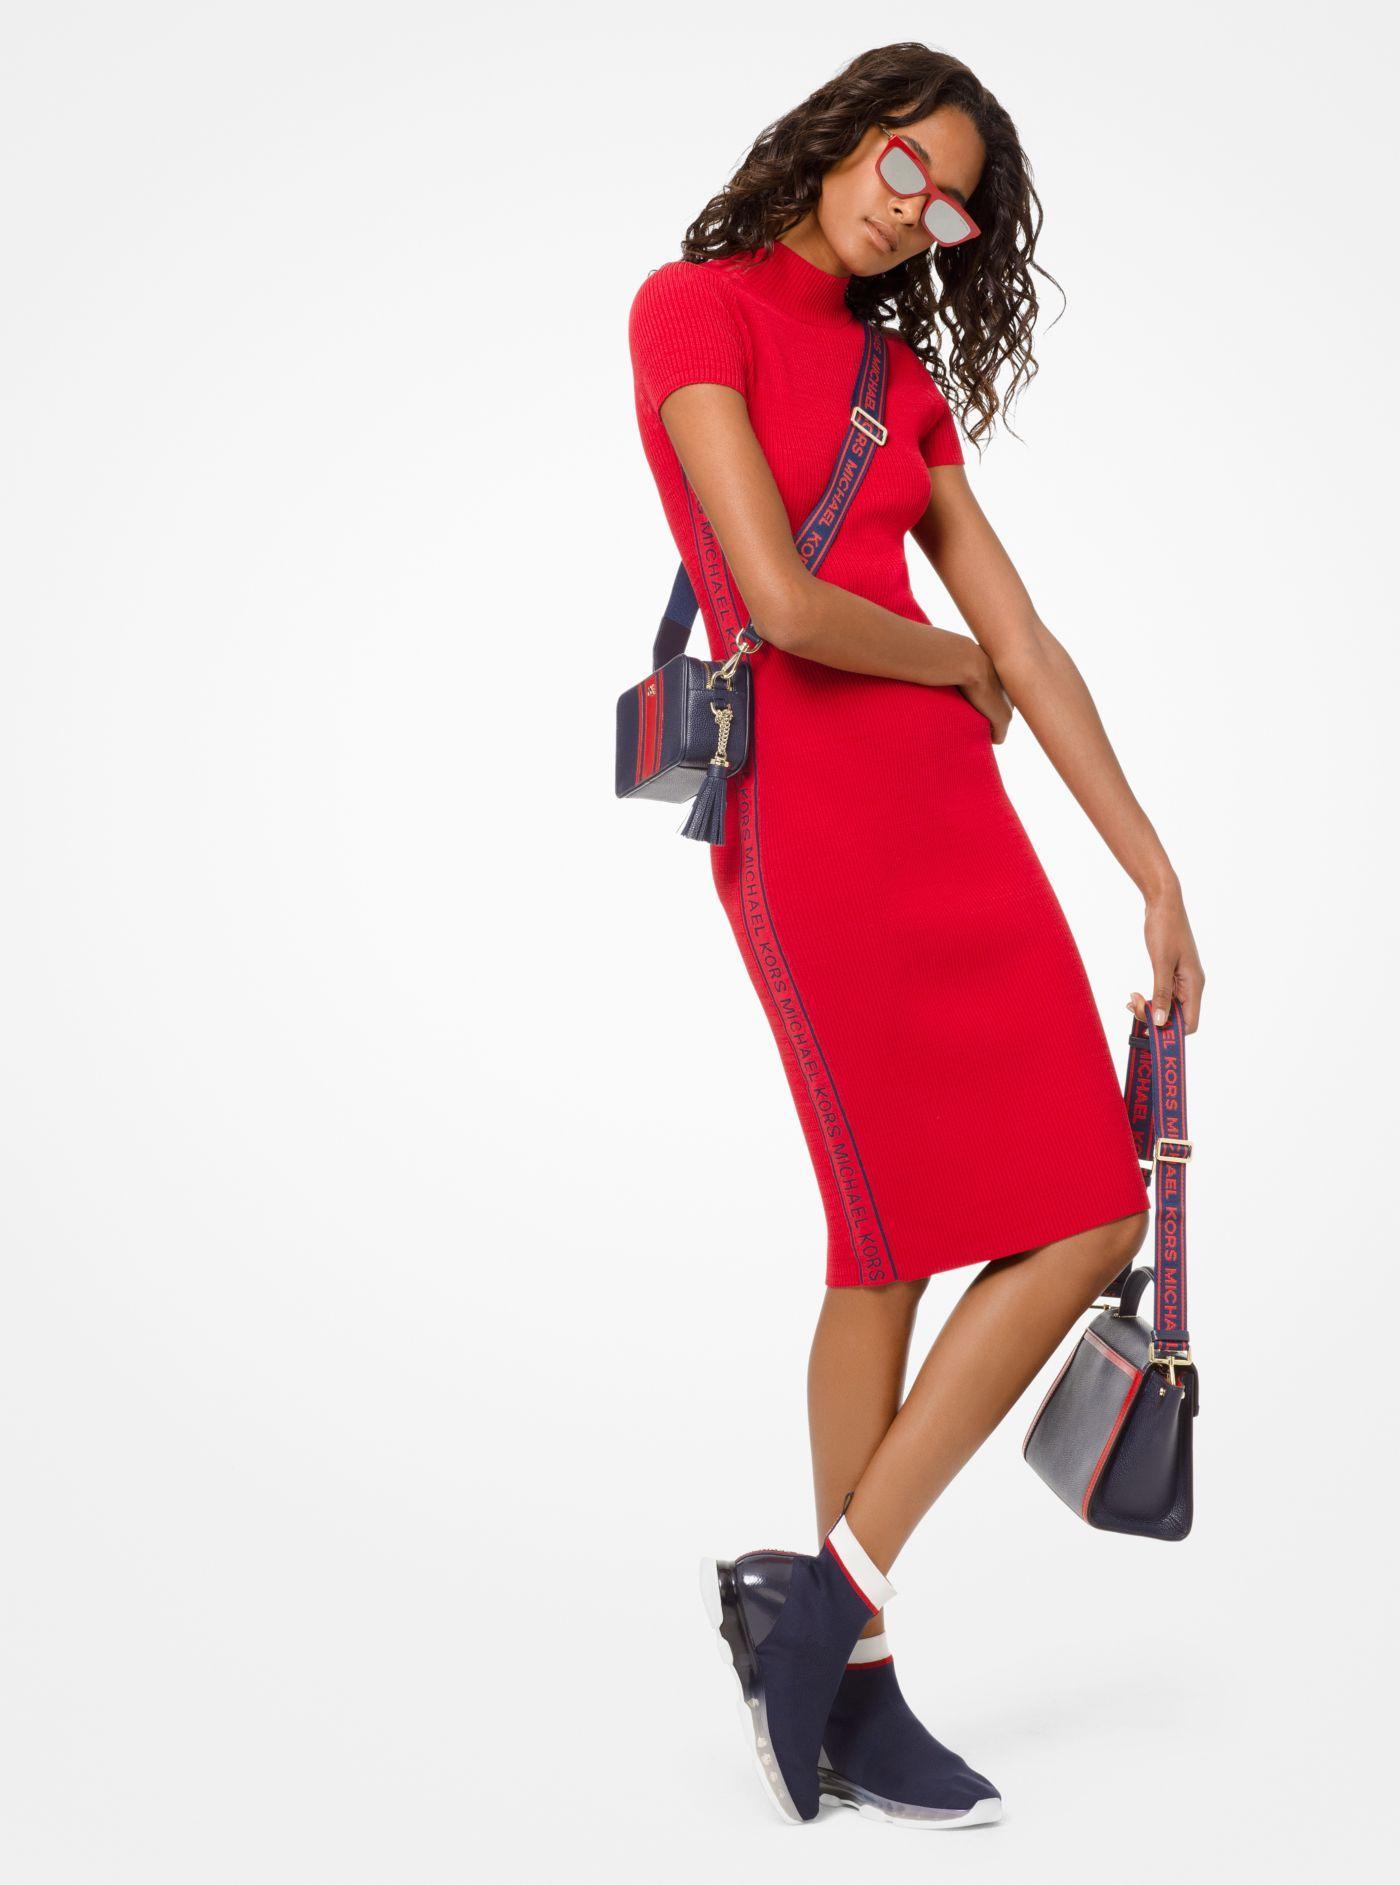 90e6fbff4b7 Michael Kors Logo Tape Ribbed Knit Dress in Red - Lyst